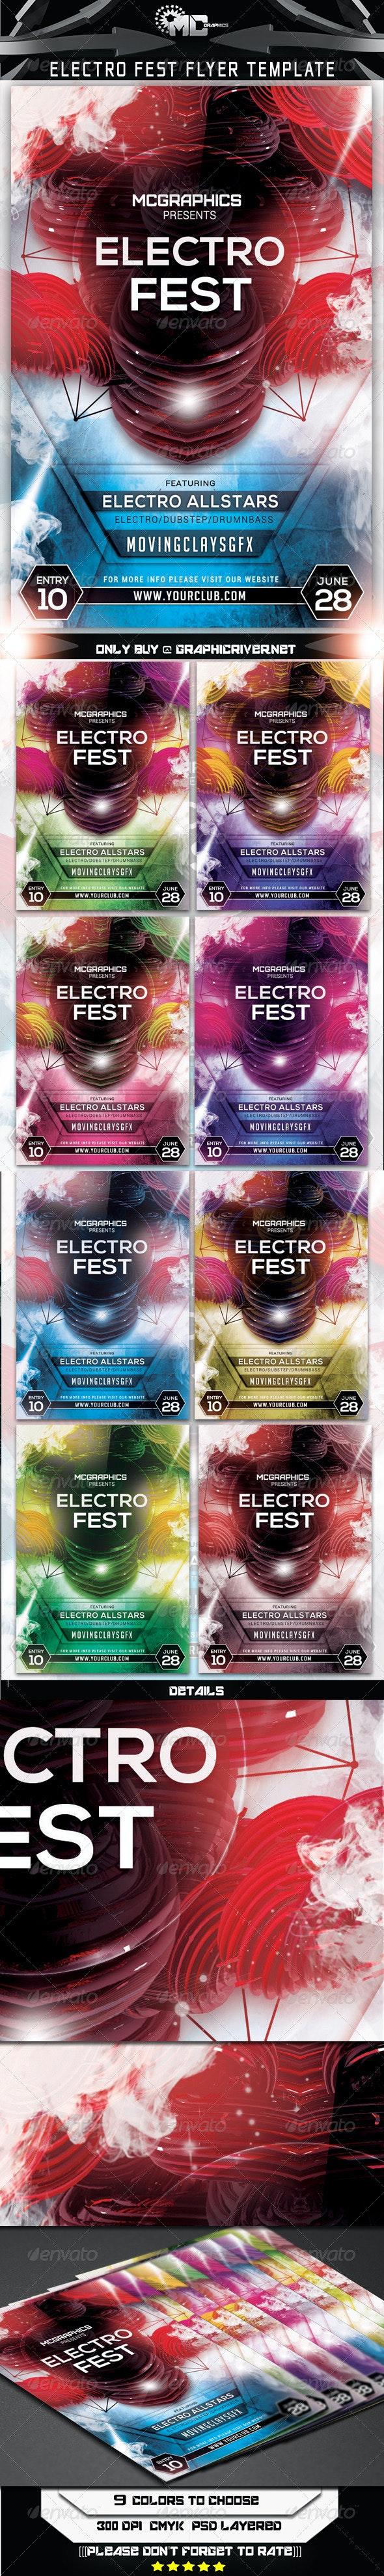 Electro Fest Flyer Template - Print Templates